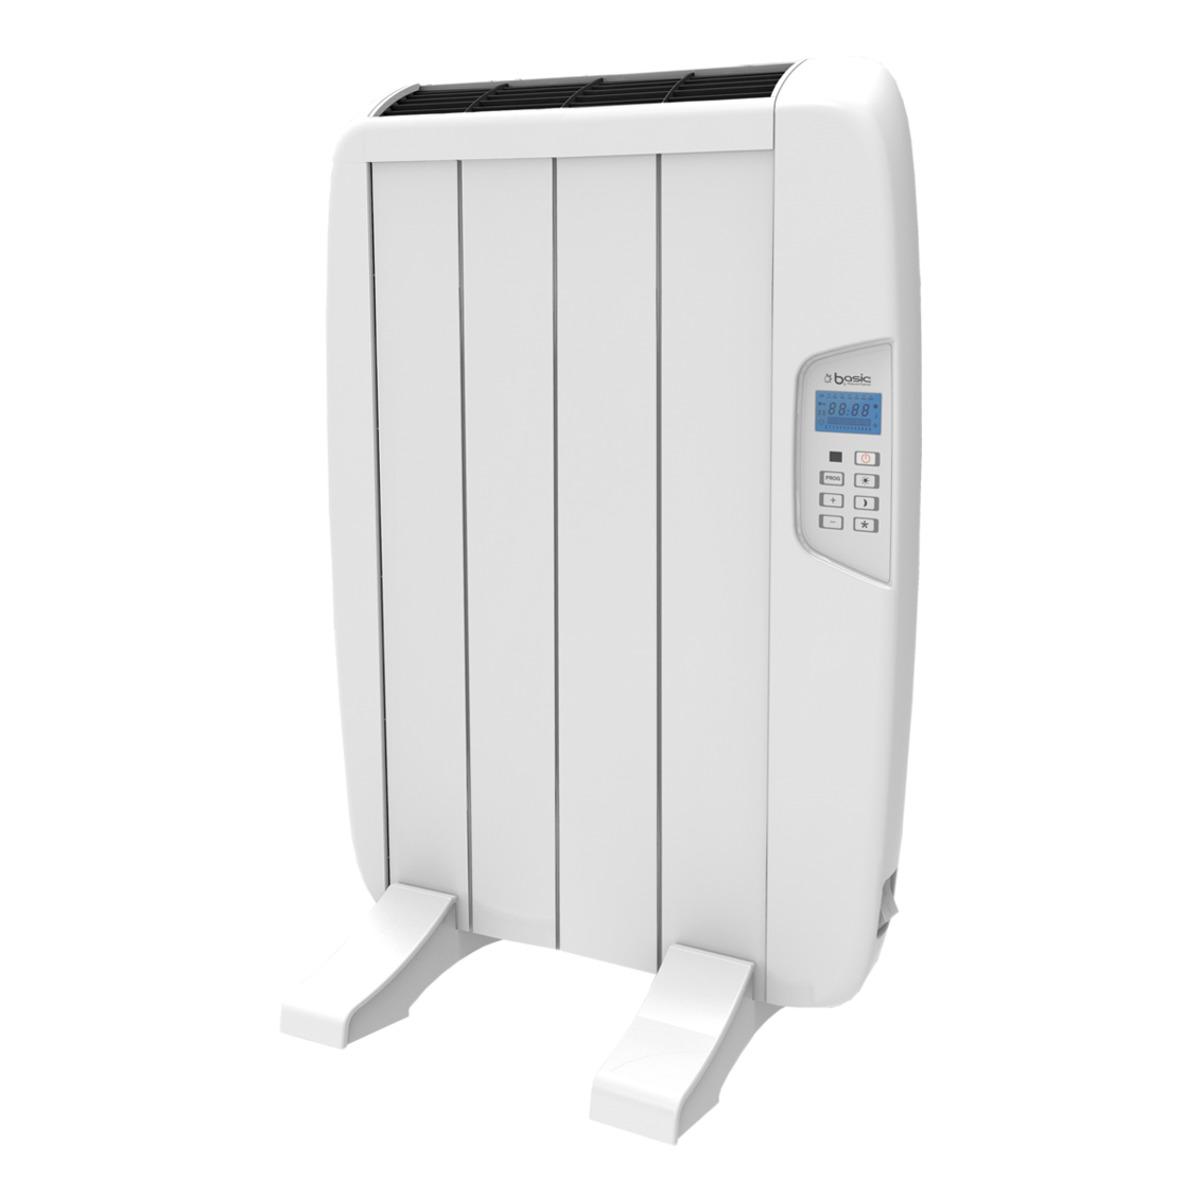 Adel ntate al fr o ocho formas de calentar tu casa sin - Emisores termicos fluido ...